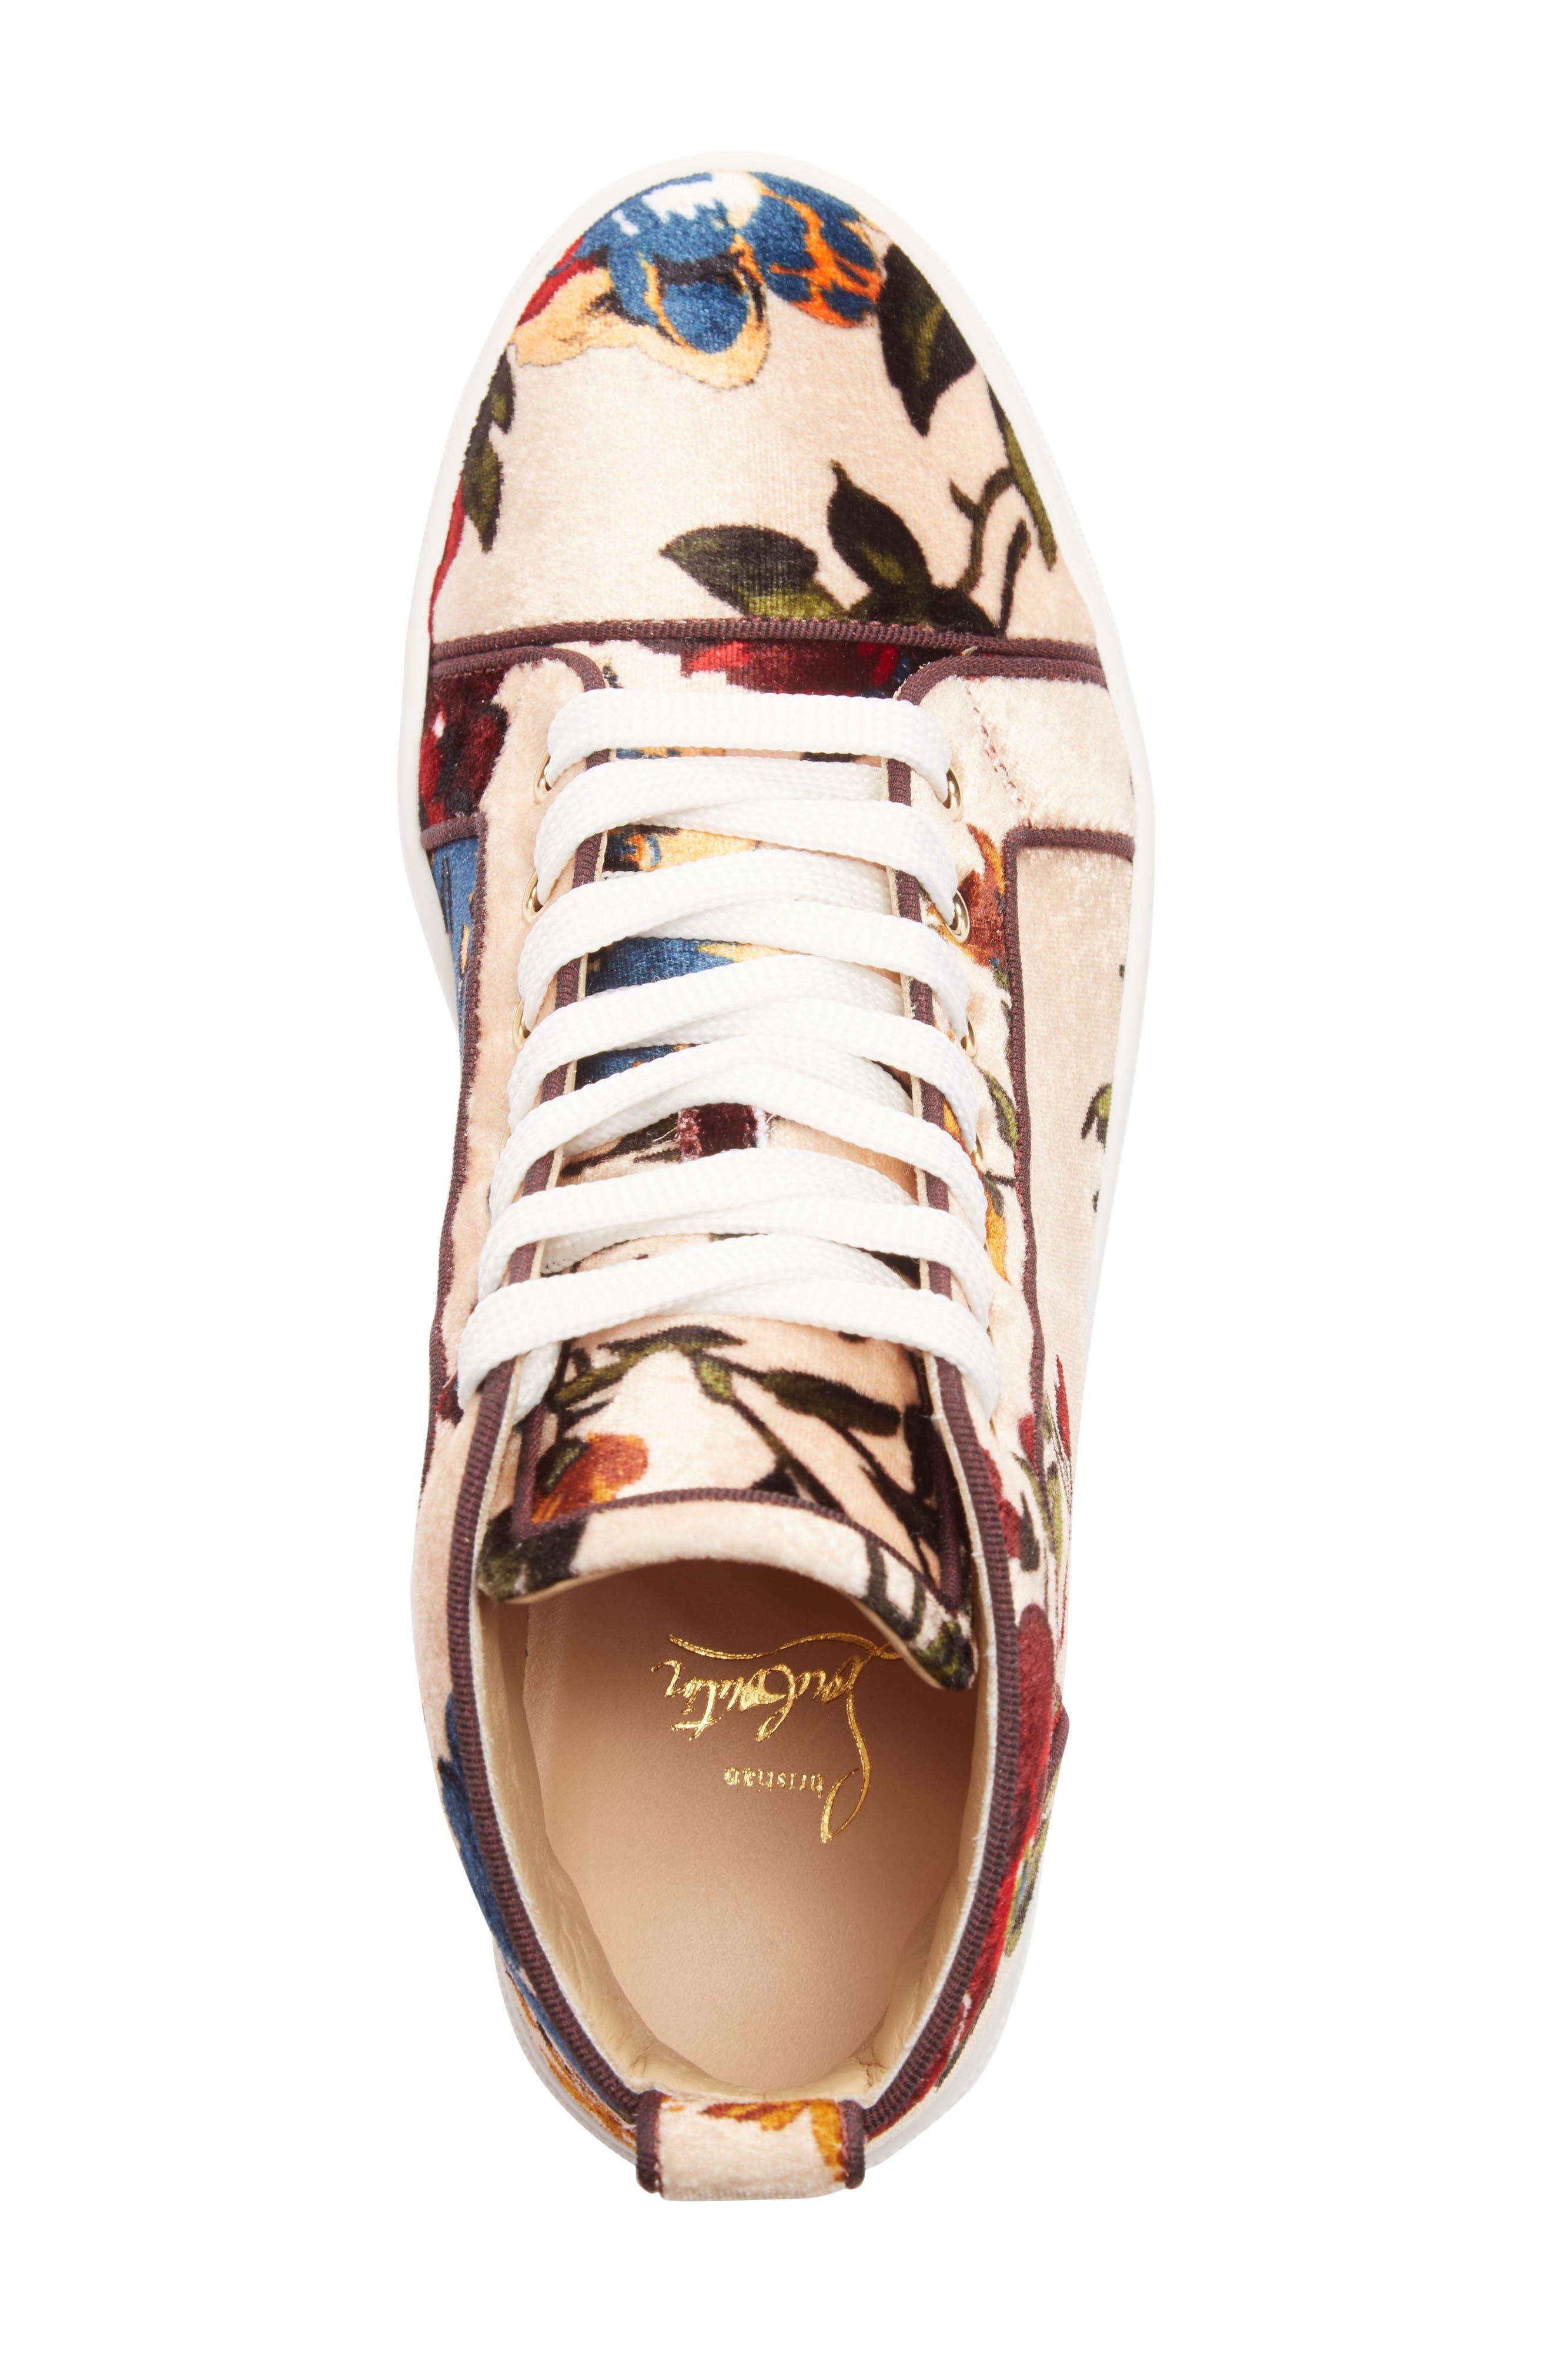 CHRISTIAN LOUBOUTIN,                             Bip Bip Floral Sneaker,                             Alternate thumbnail 4, color,                             250